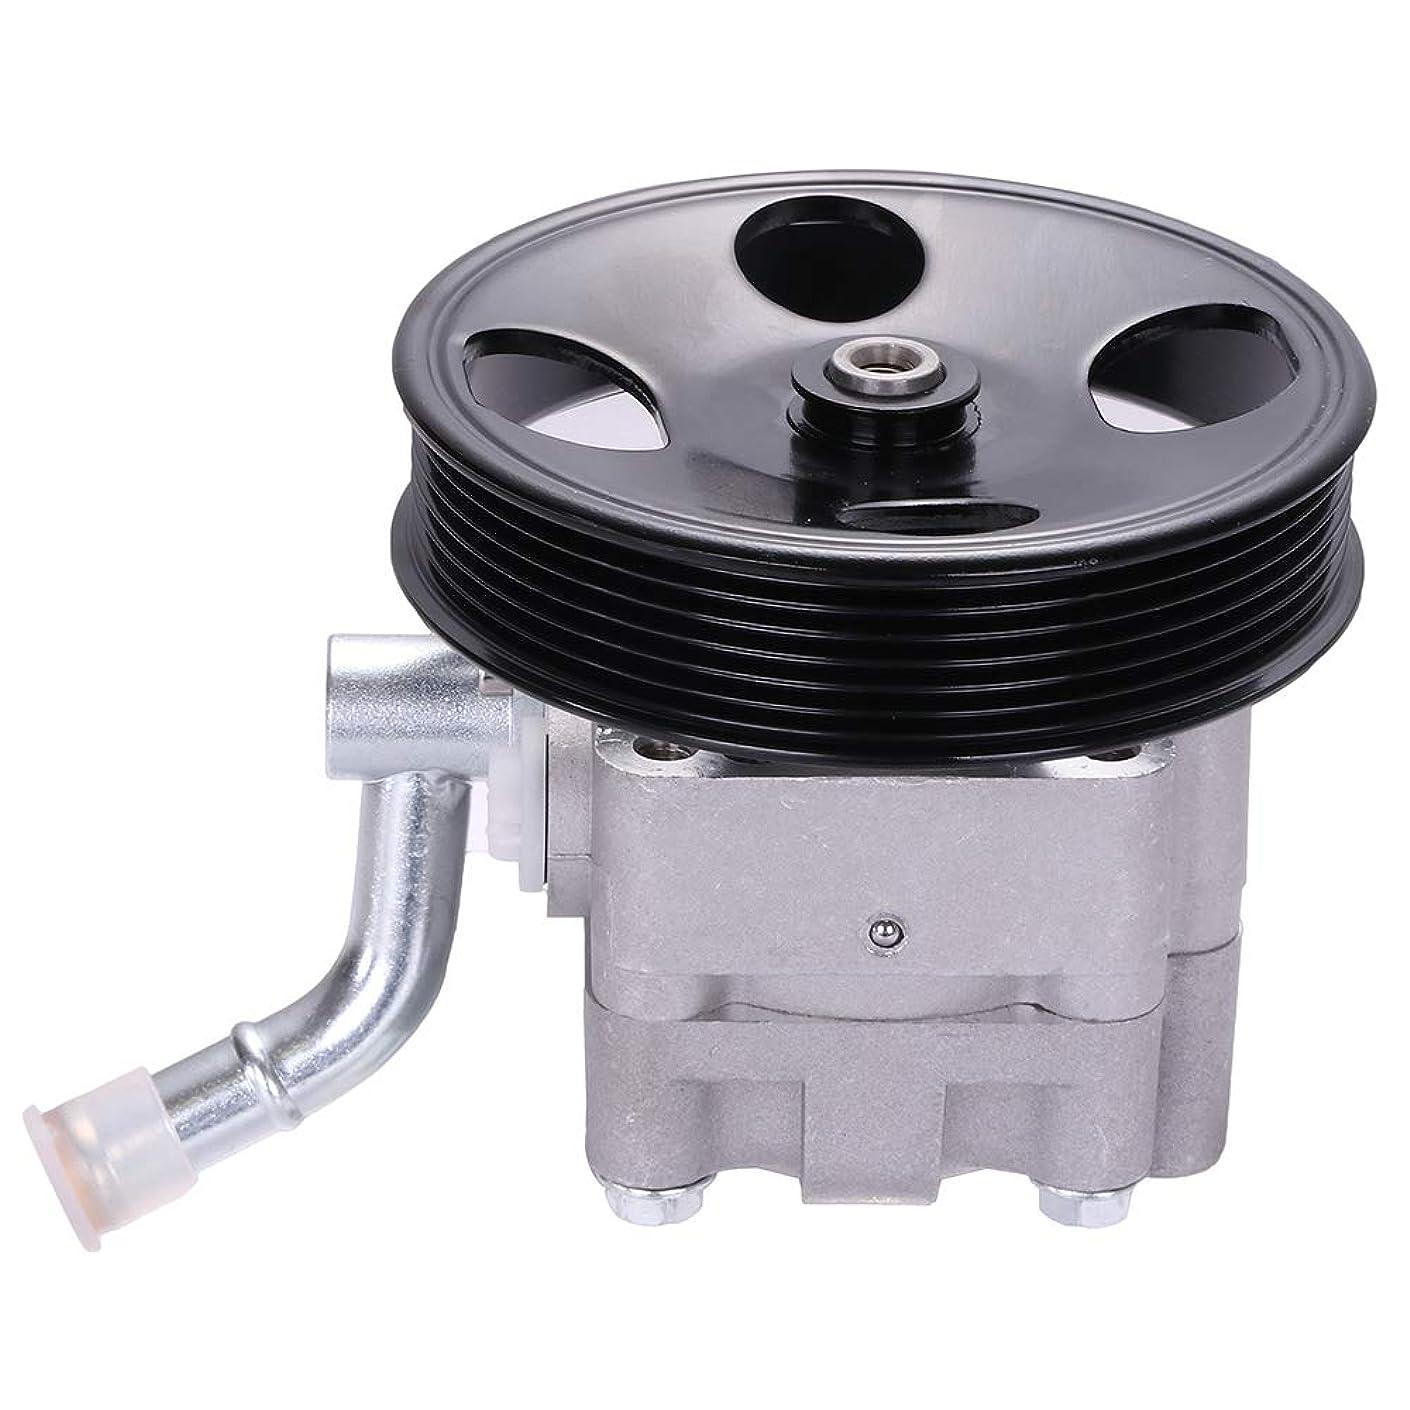 ECCPP 21-5412 Power Steering Pump Power Assist Pump Fit for 2003-2008 Infiniti FX35 Base Sport Utility 4-Door 3.5L